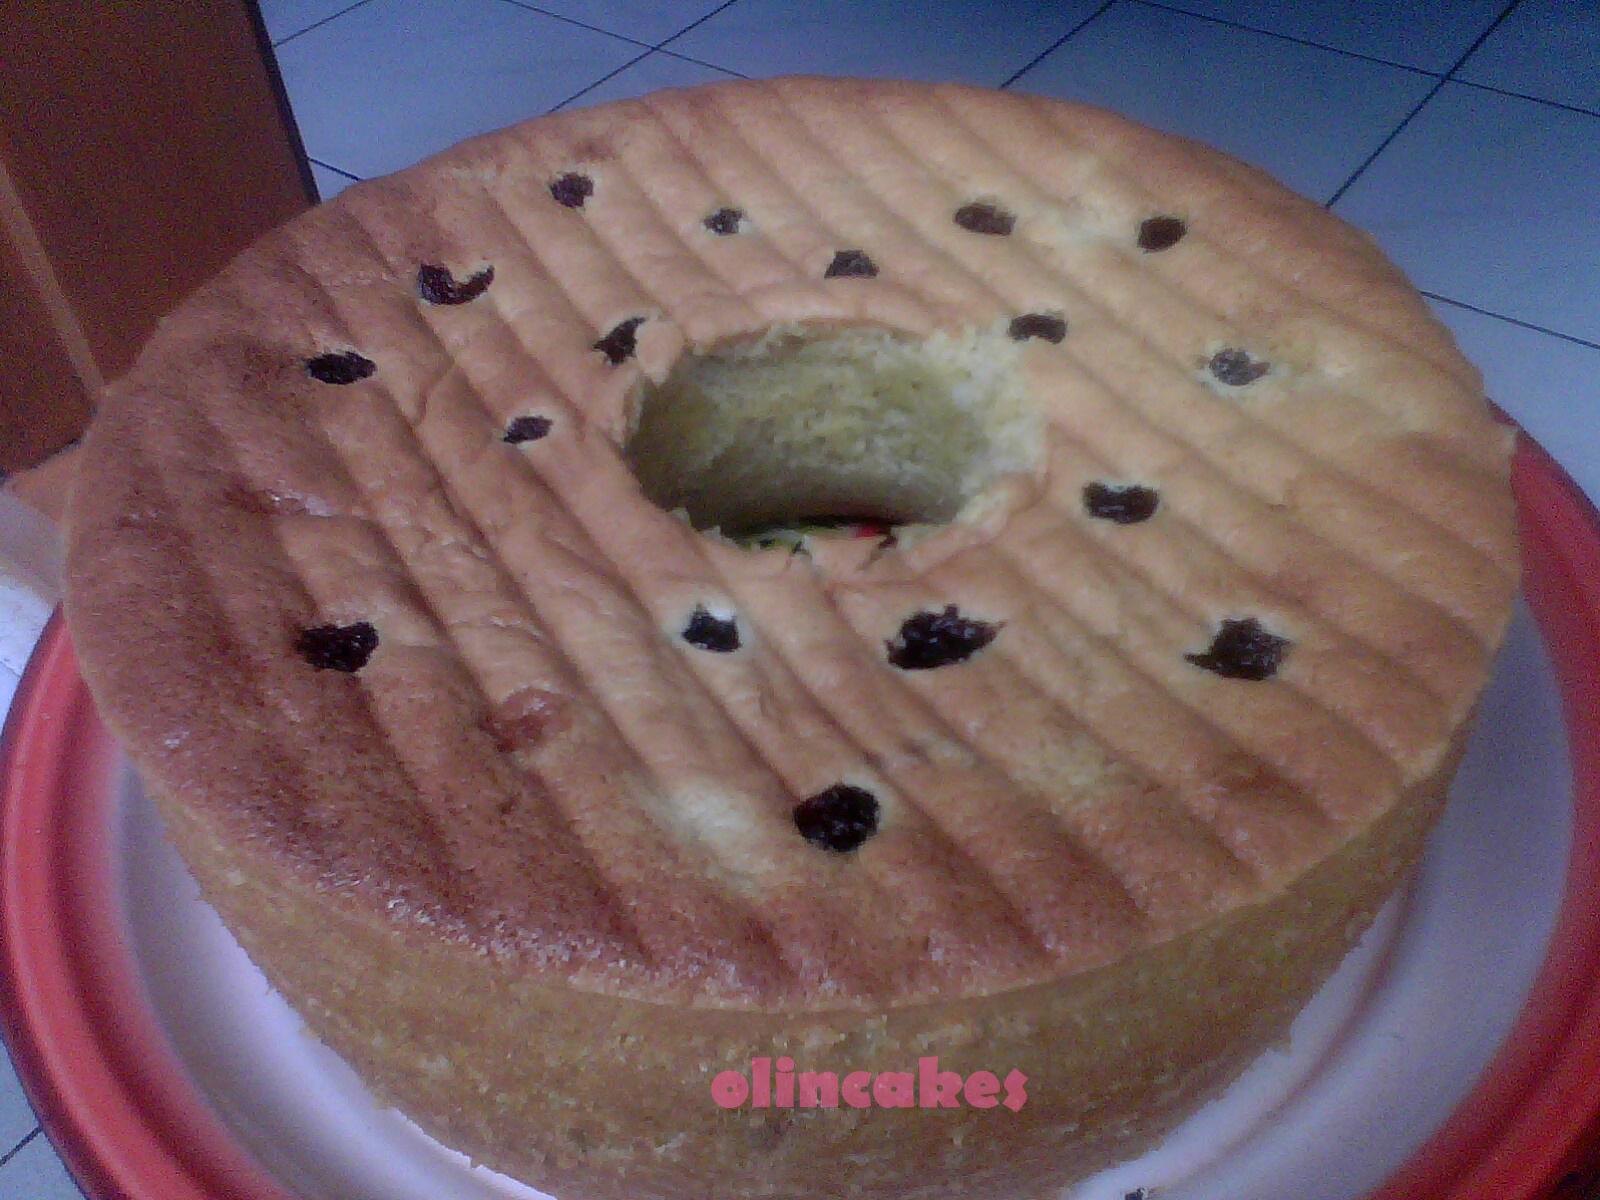 Resep Cake Pisang Kukus Ncc: Olincakes: Cake Pisang Oven